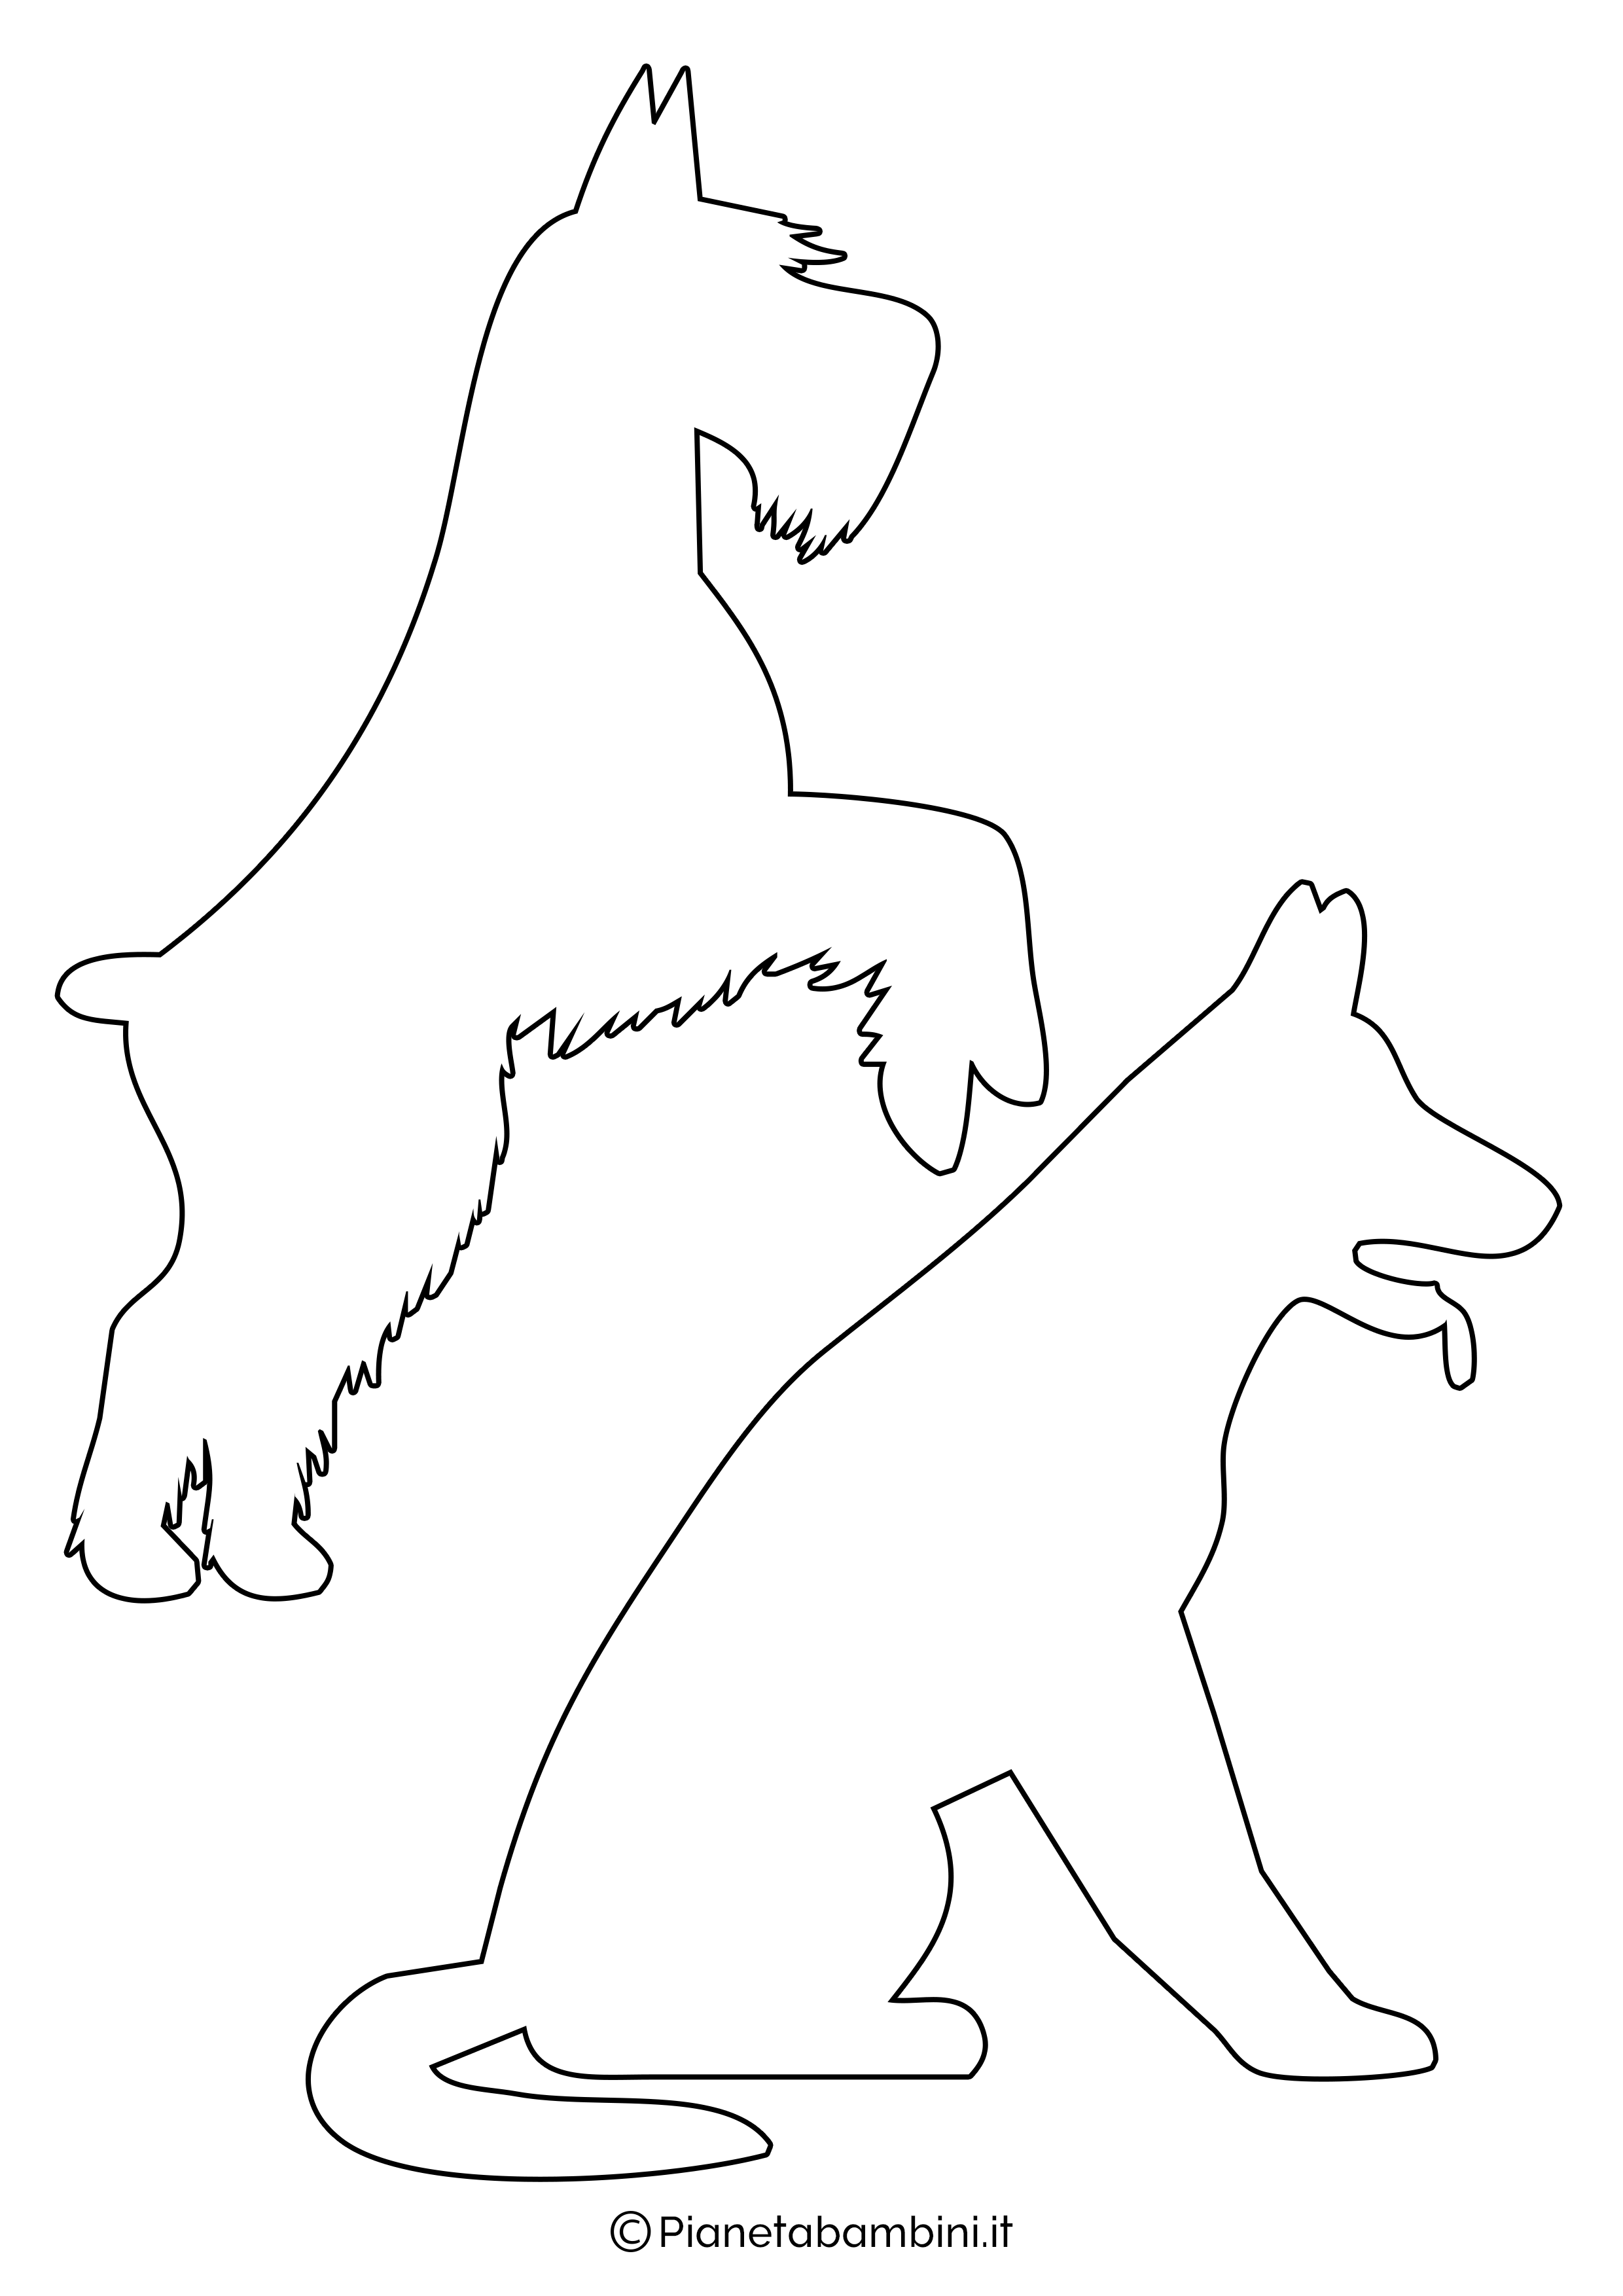 Sagome di cani medie da ritagliare 3